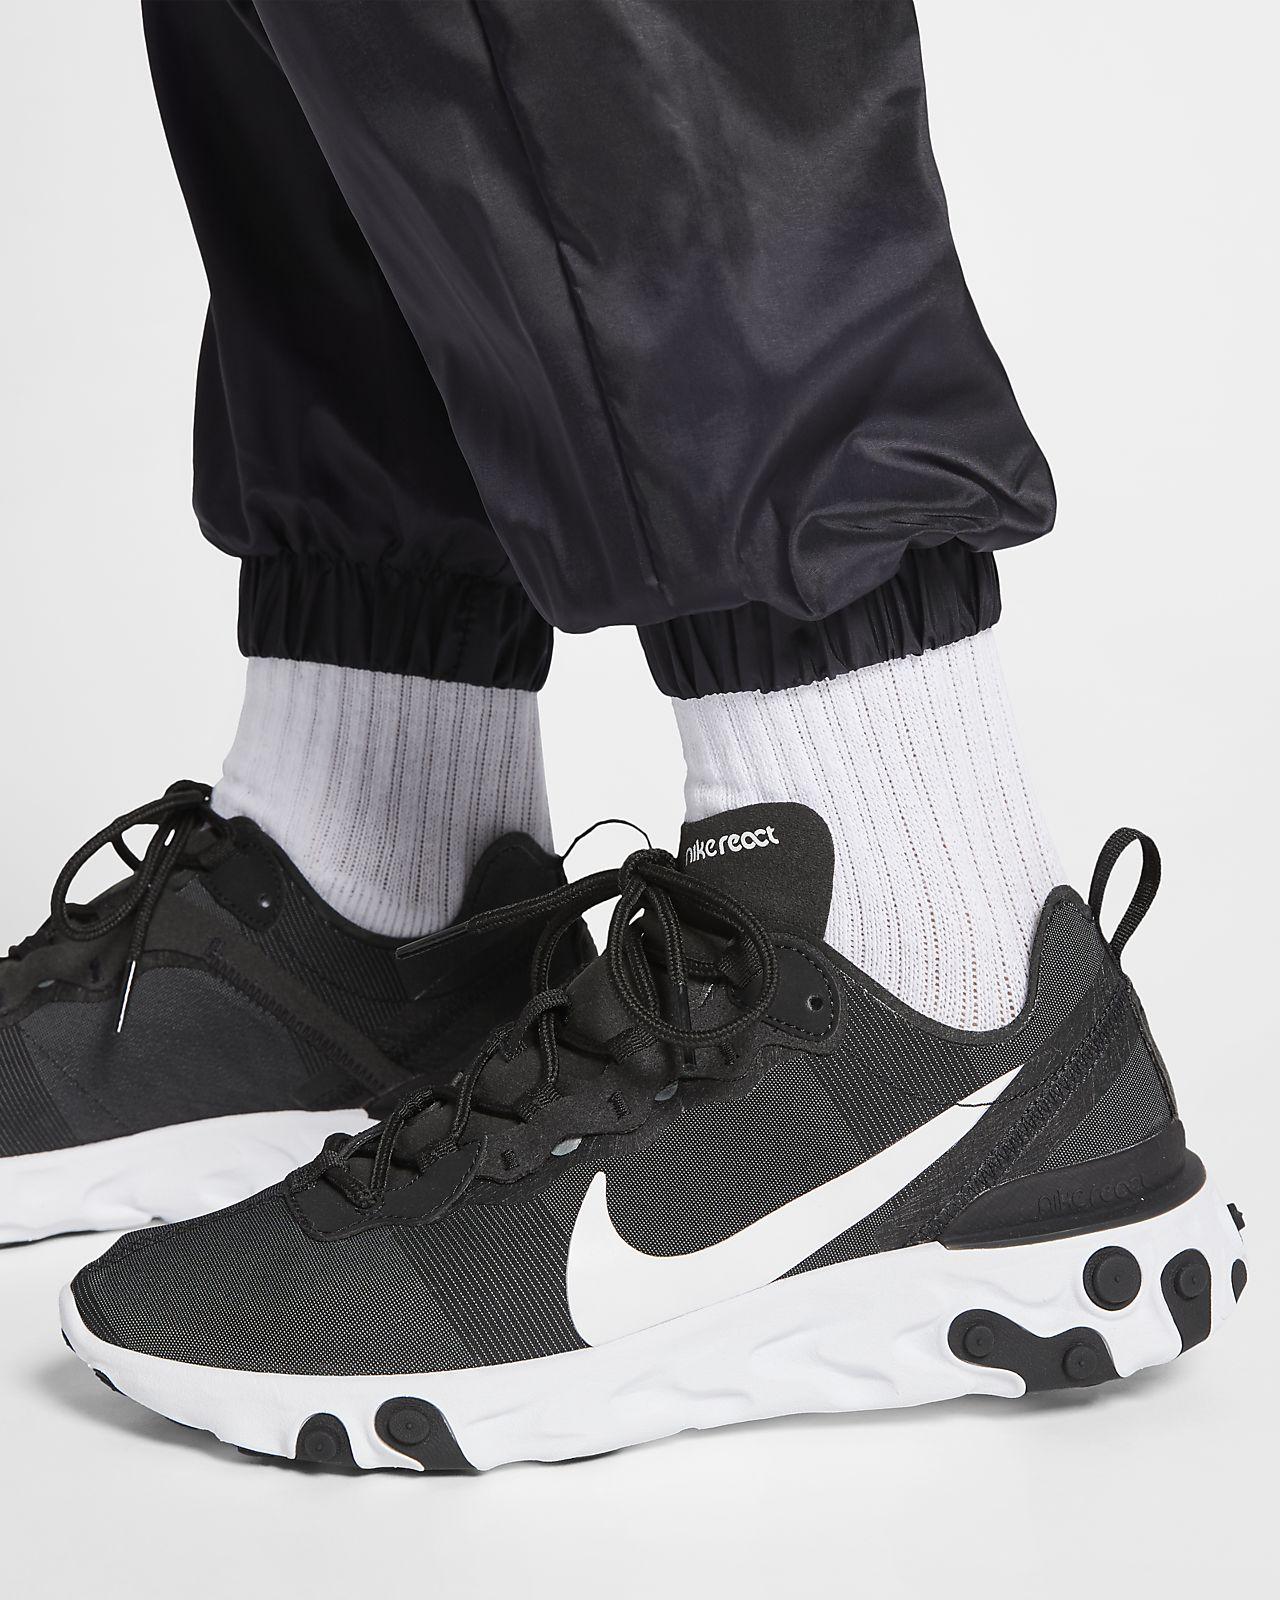 68c5ac8f8d18d5 Nike Sportswear Tech Pack Women s Woven Pants. Nike.com